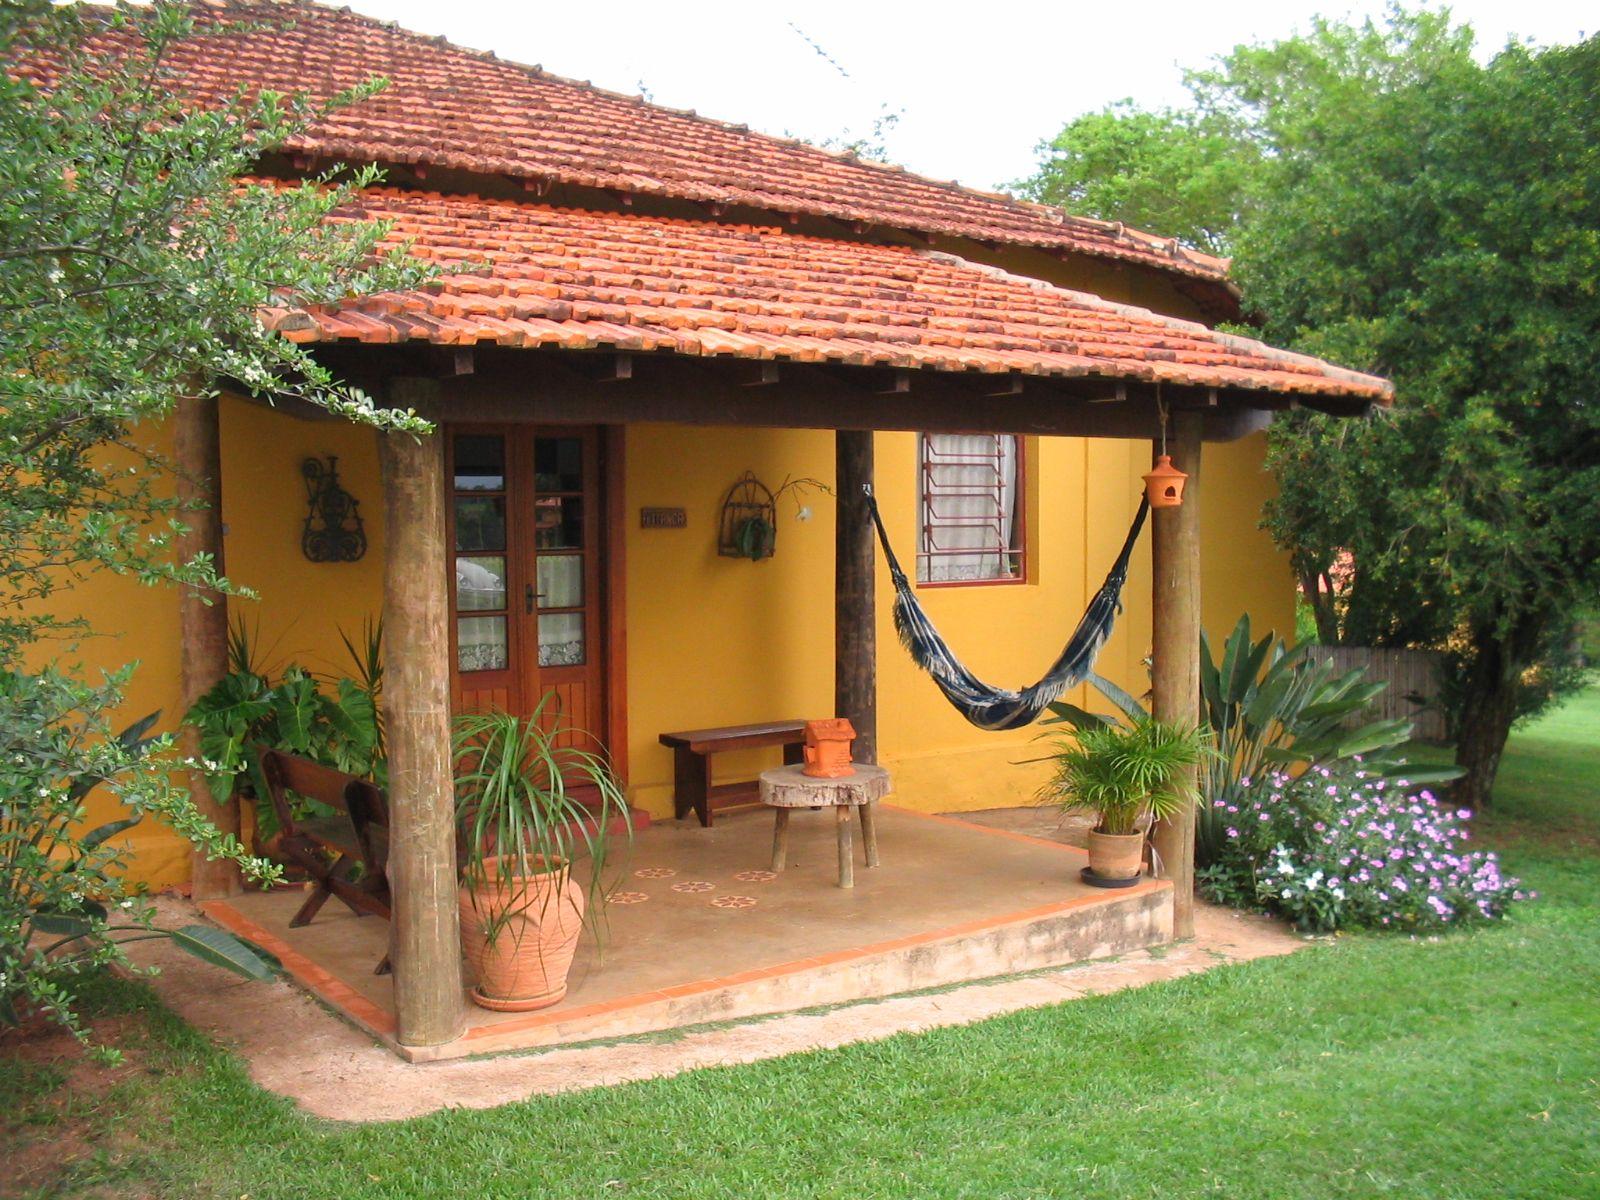 Pousada rural bem pequena pesquisa google casas de - Casas rurales madera ...